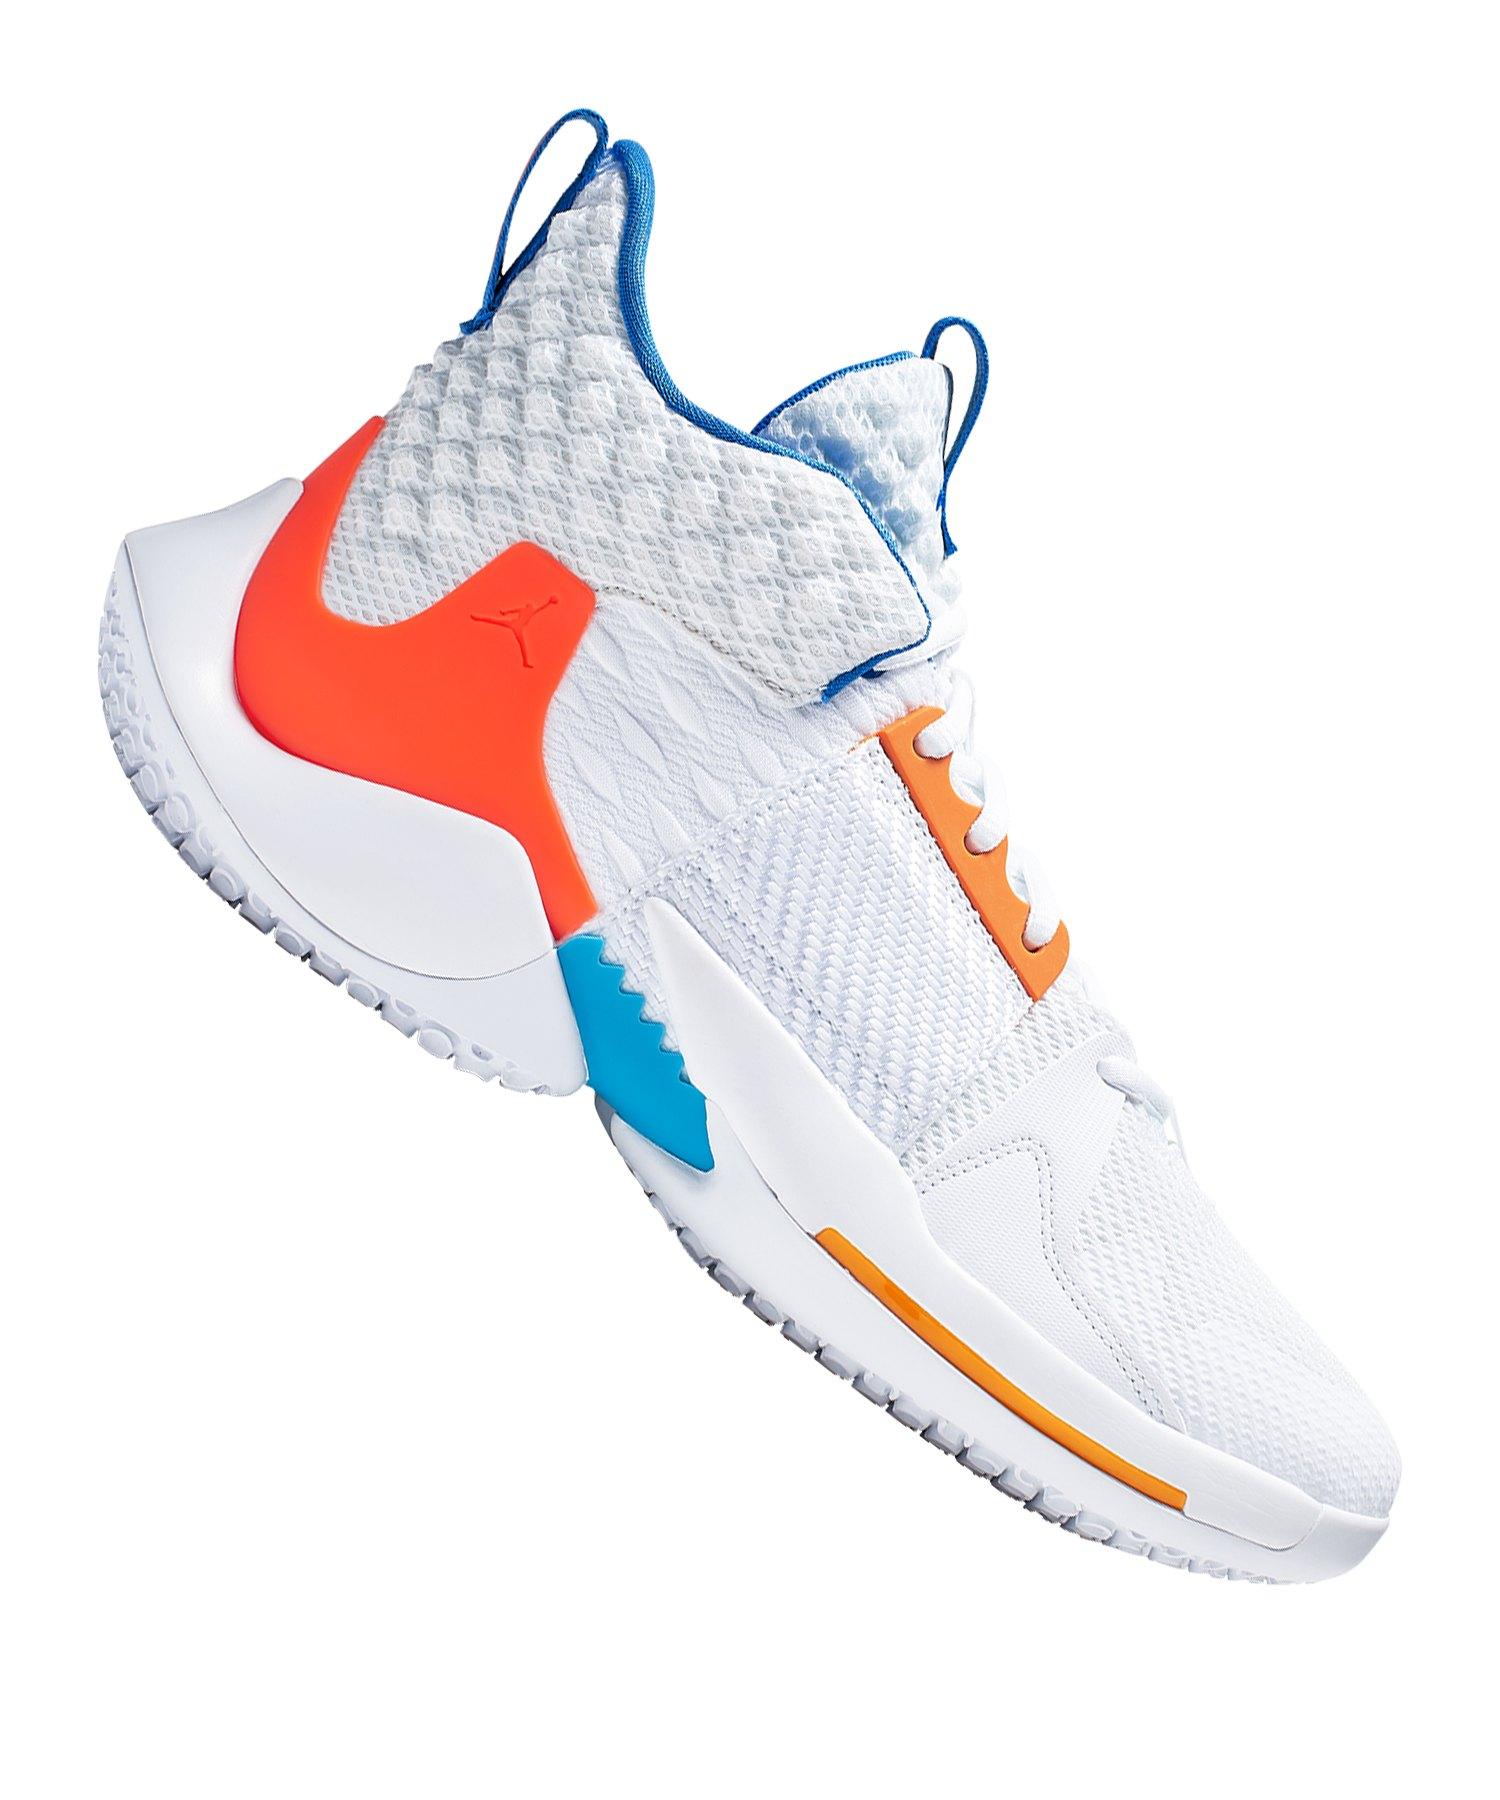 online store eb37a dca17 Jordan Why Not Zer0.2 Sneaker Weiss Rot Blau F100 - weiss